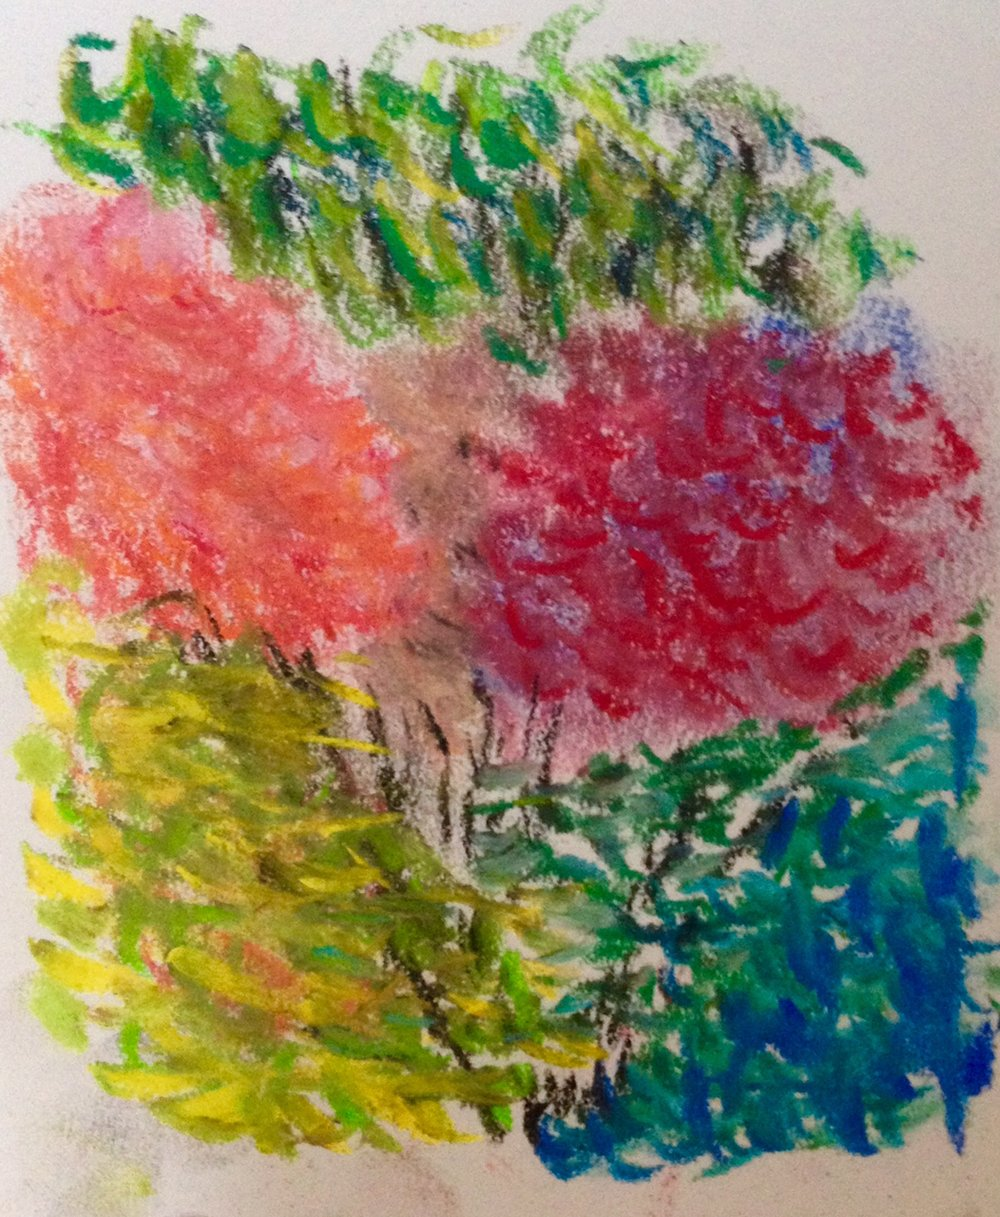 08_pastel drawing.jpg